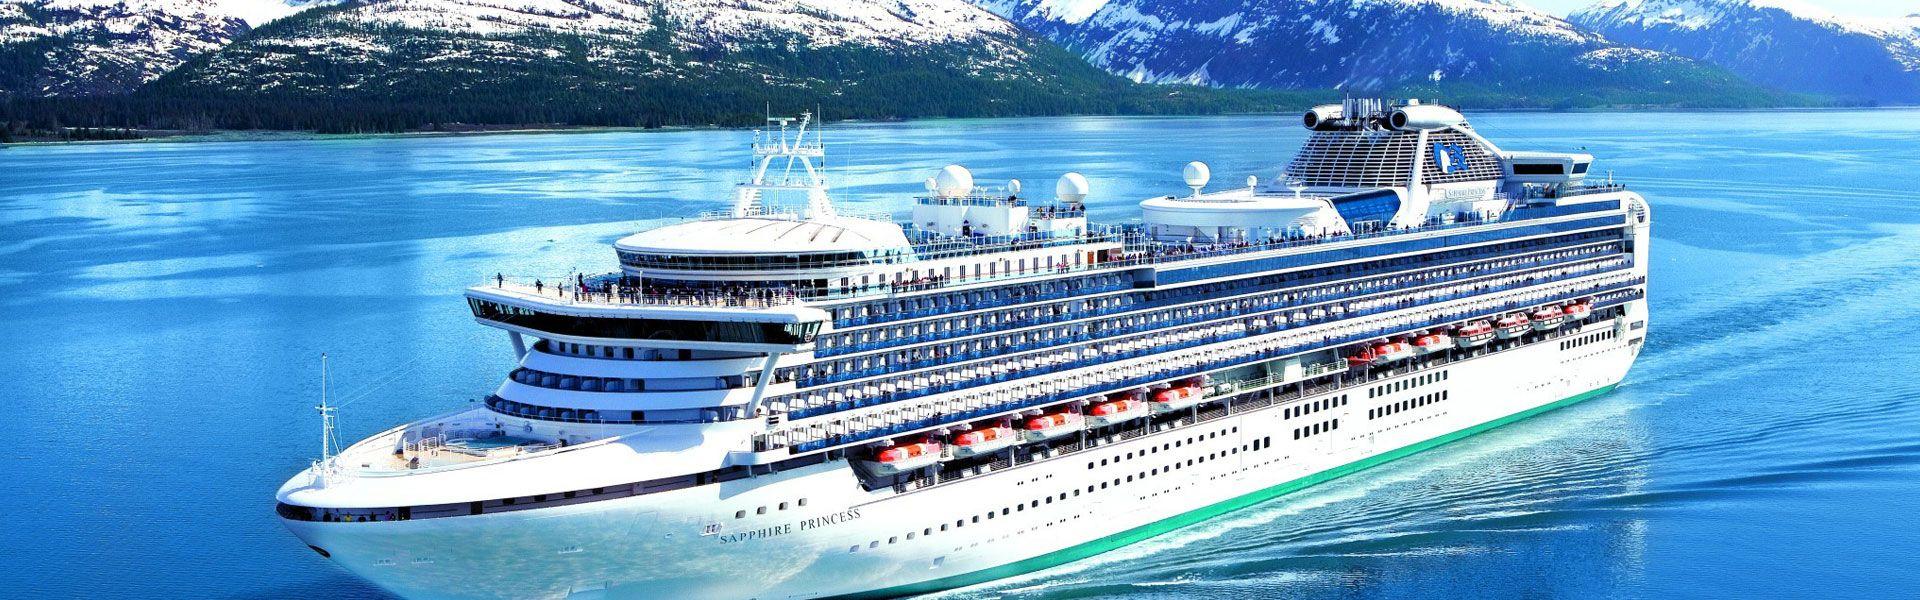 Croaziera 2018 - Asia de Sud-Est (Singapore) - Princess Cruises - Sapphire Princess - 10 nopti